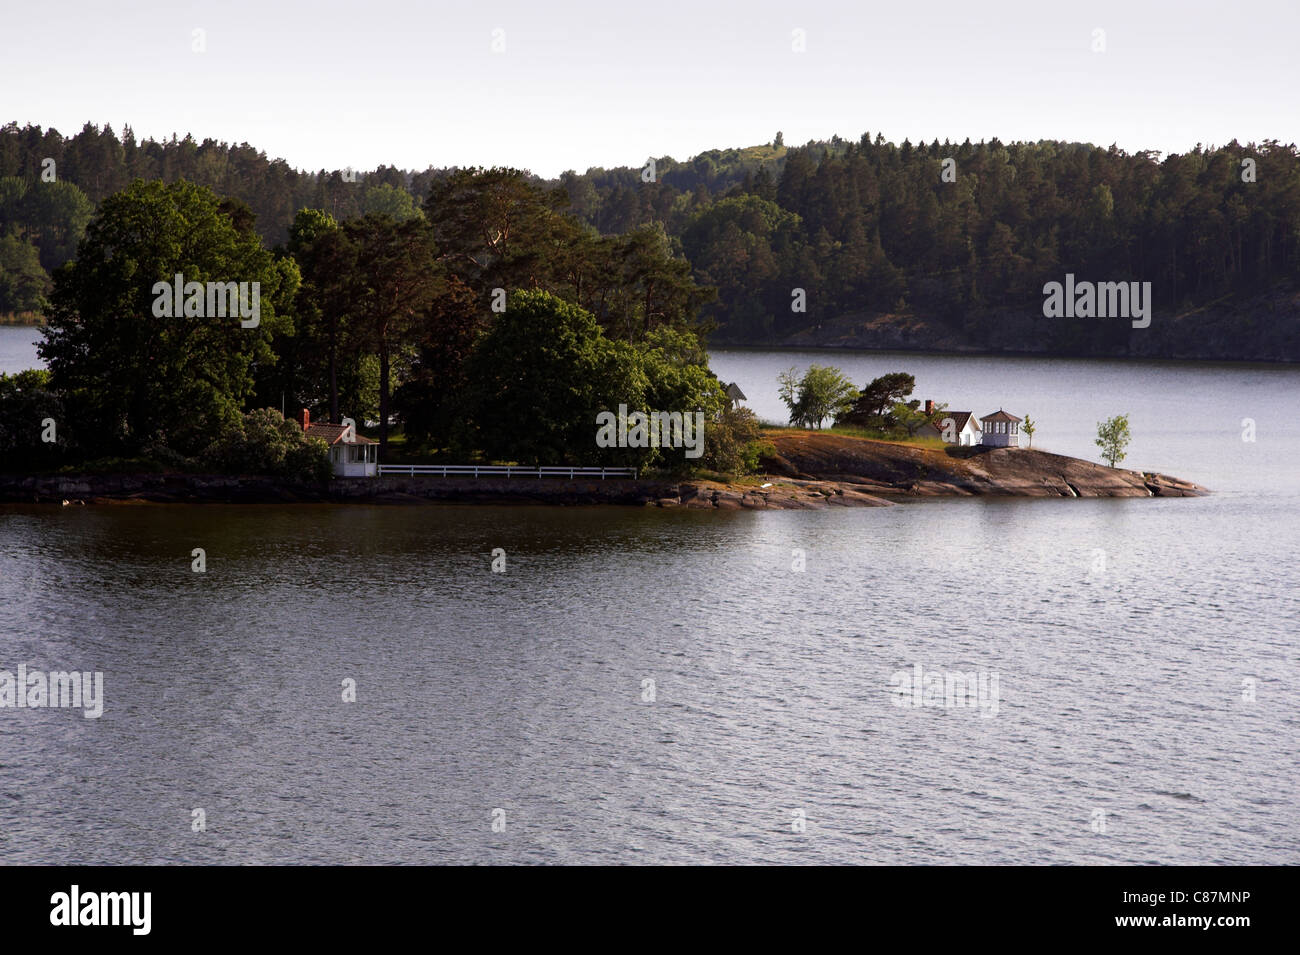 Island in the Stockholm archipelago, Sweden Stock Photo